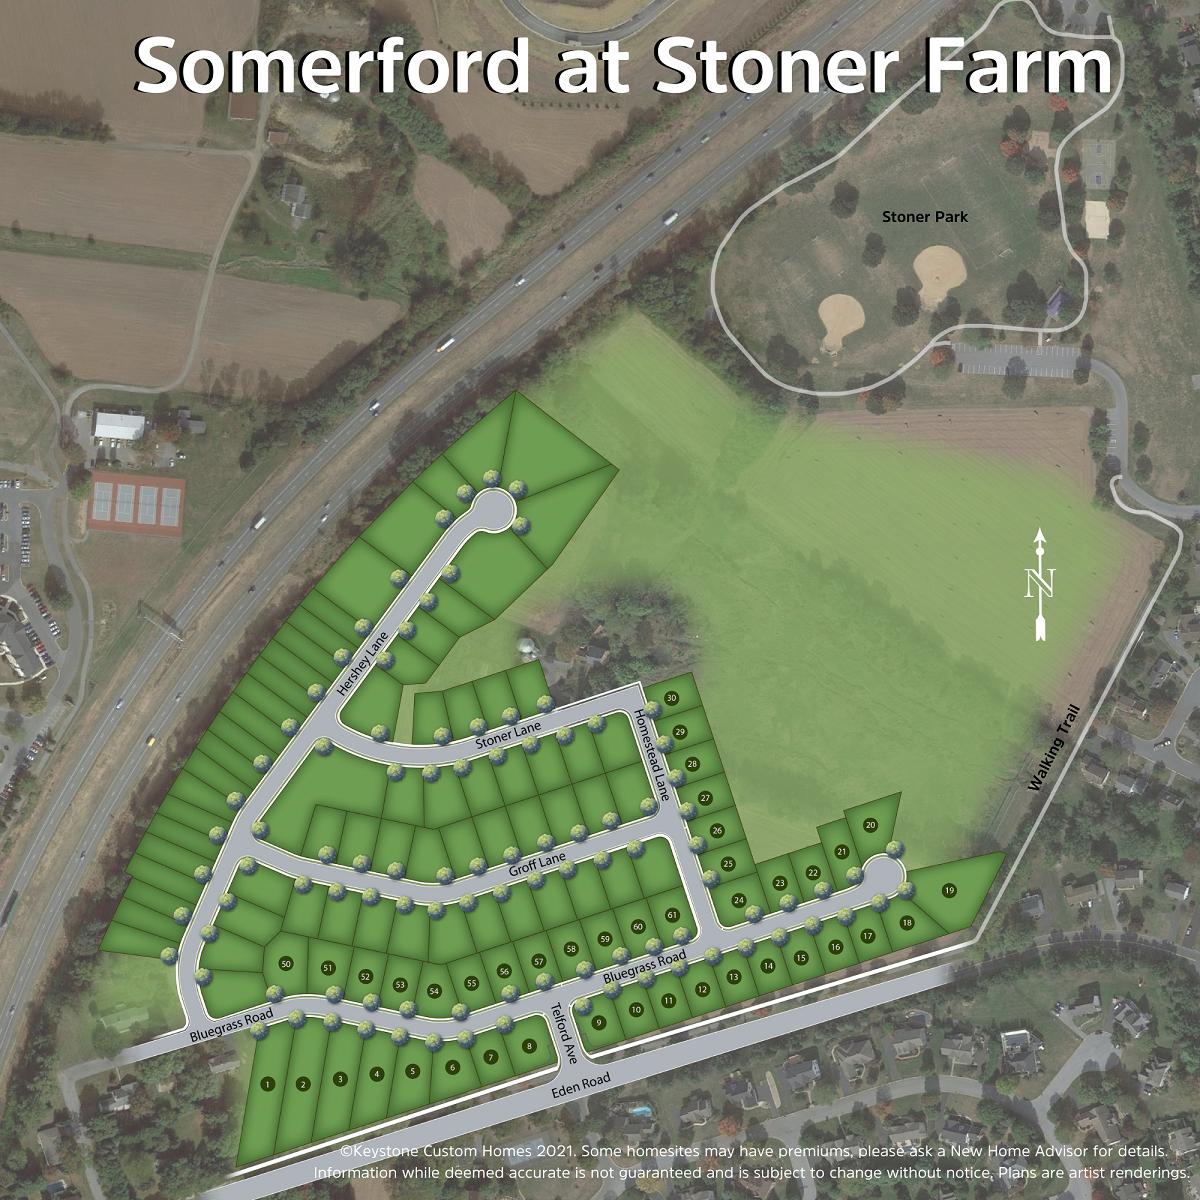 Somerford at Stoner Farm Lot Map Background